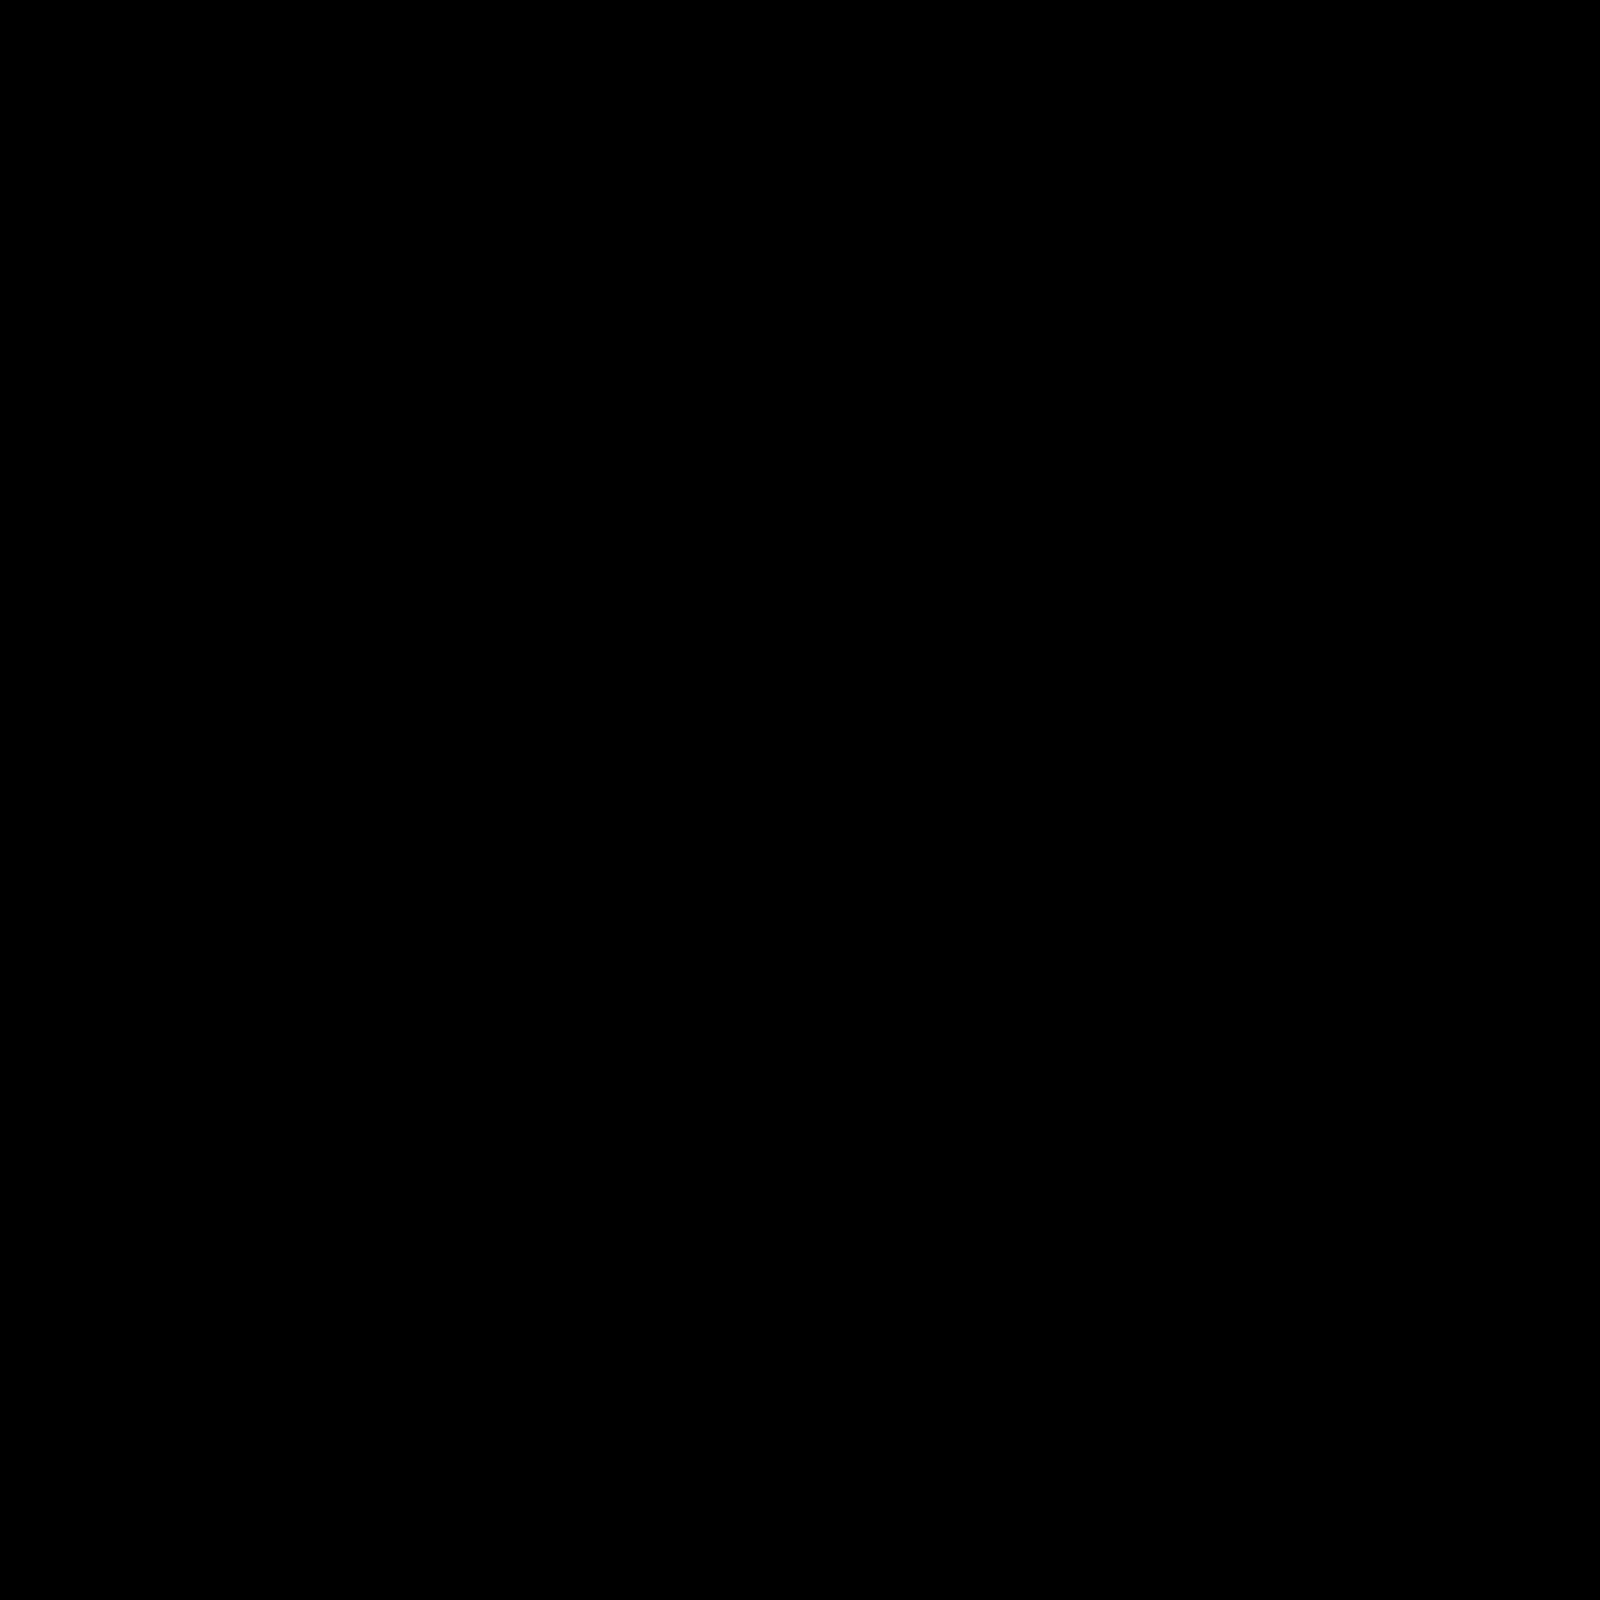 jpg transparent stock Sand Timer Icon